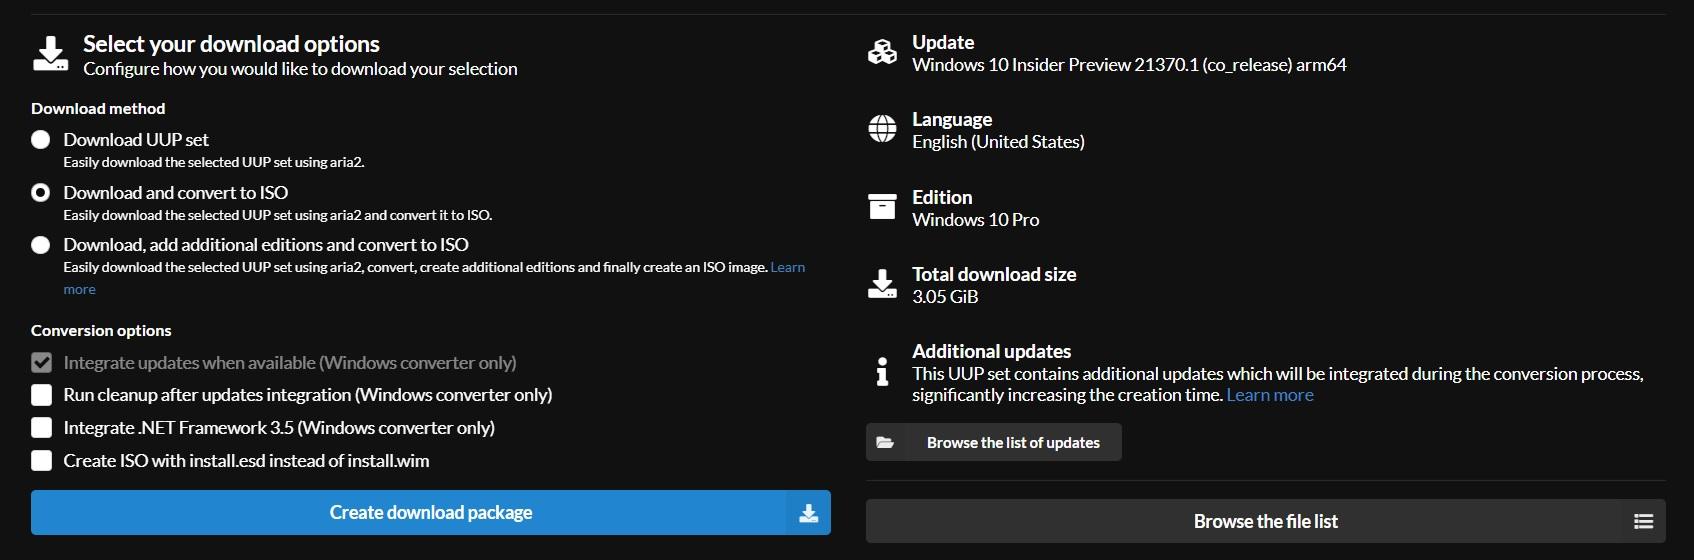 Windows 10 image selector